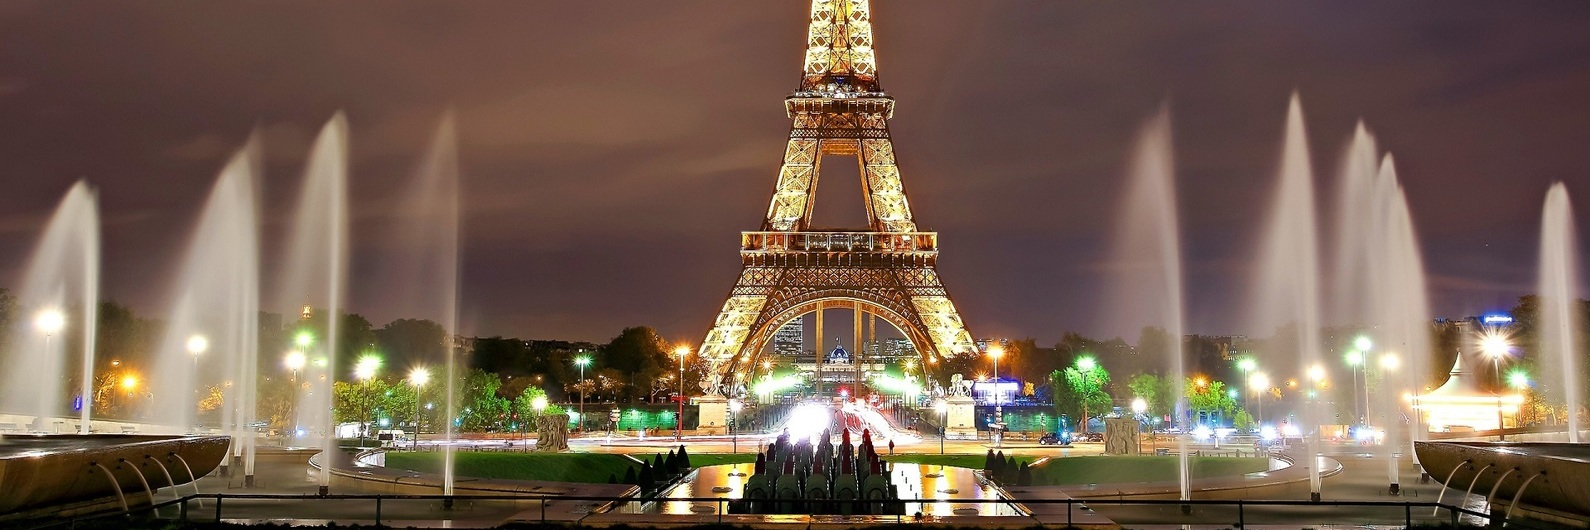 Sete razões para amar Paris